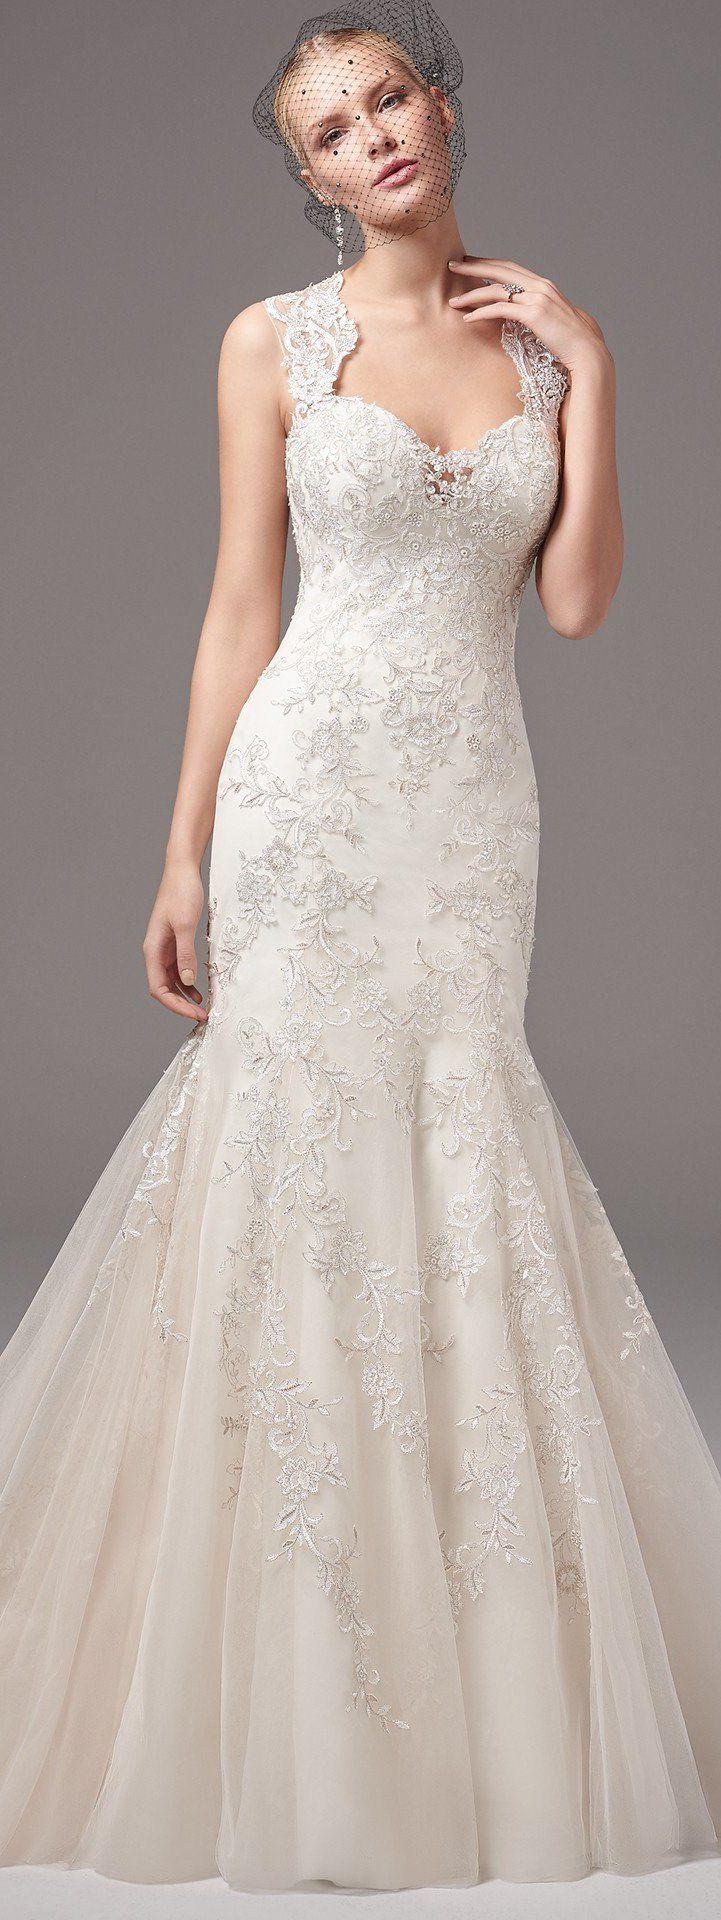 Sottero and Midgley Wedding Dress | @maggiesottero #sotteroandmidgley #midgleybride